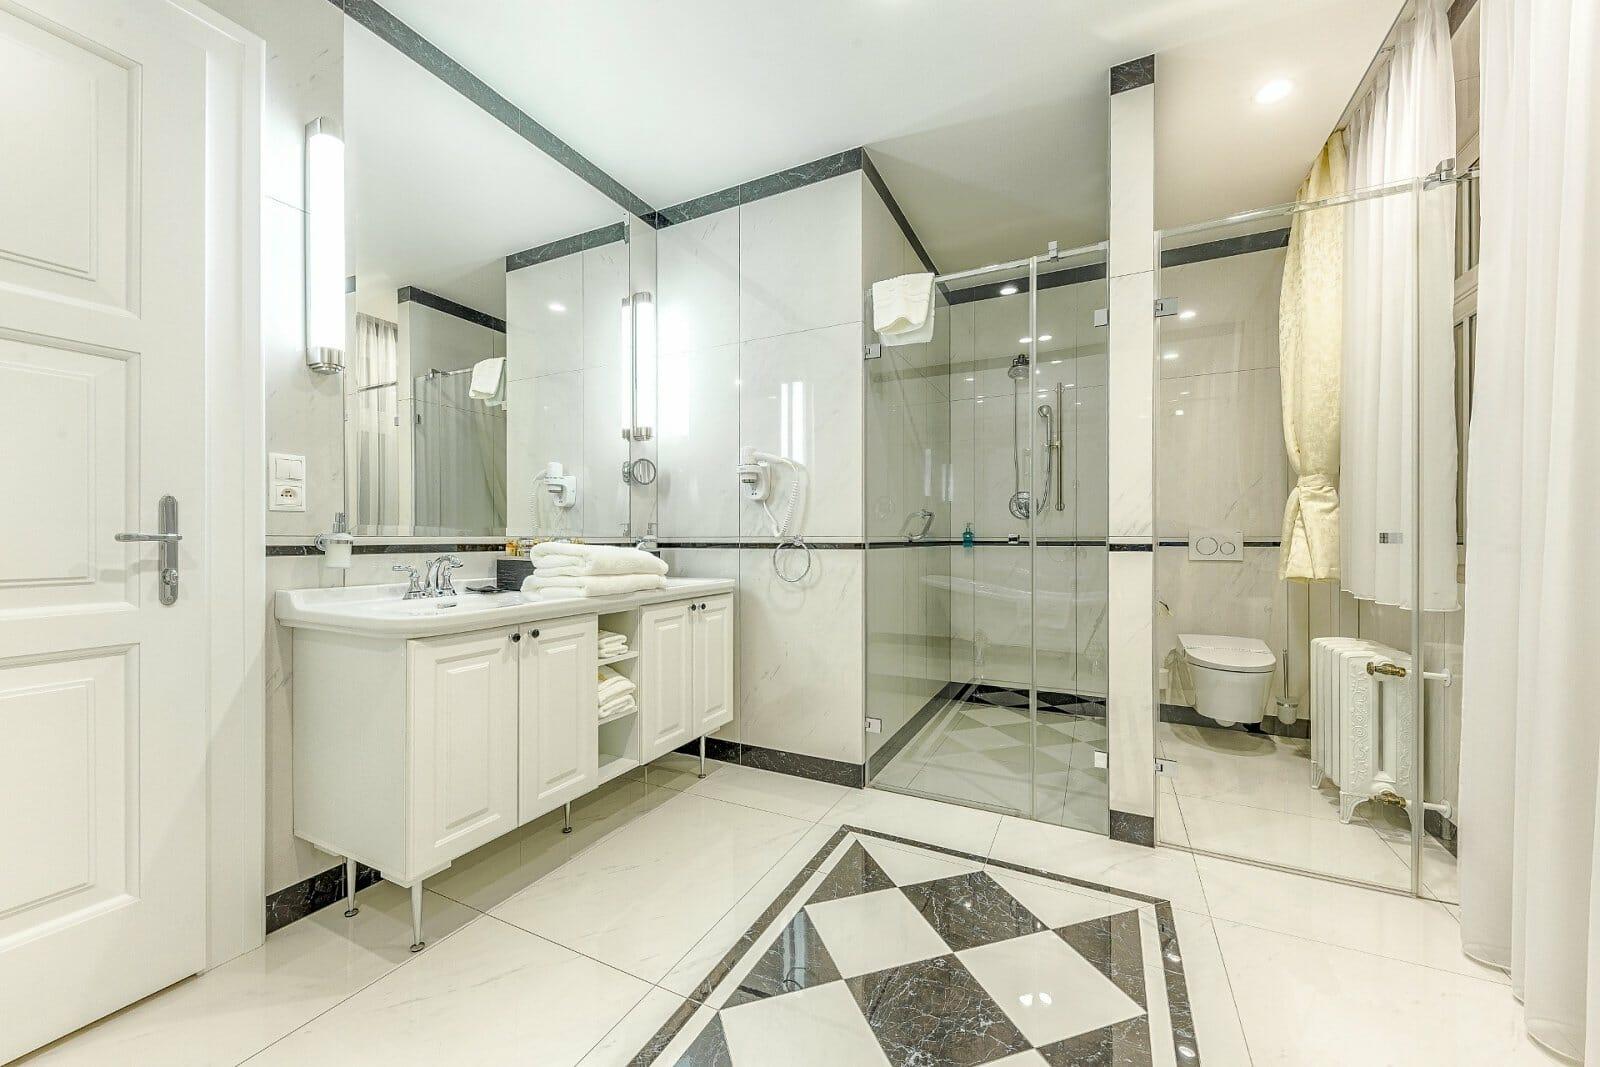 Kúpeľňa, Royal Palace, Turčianske Teplice